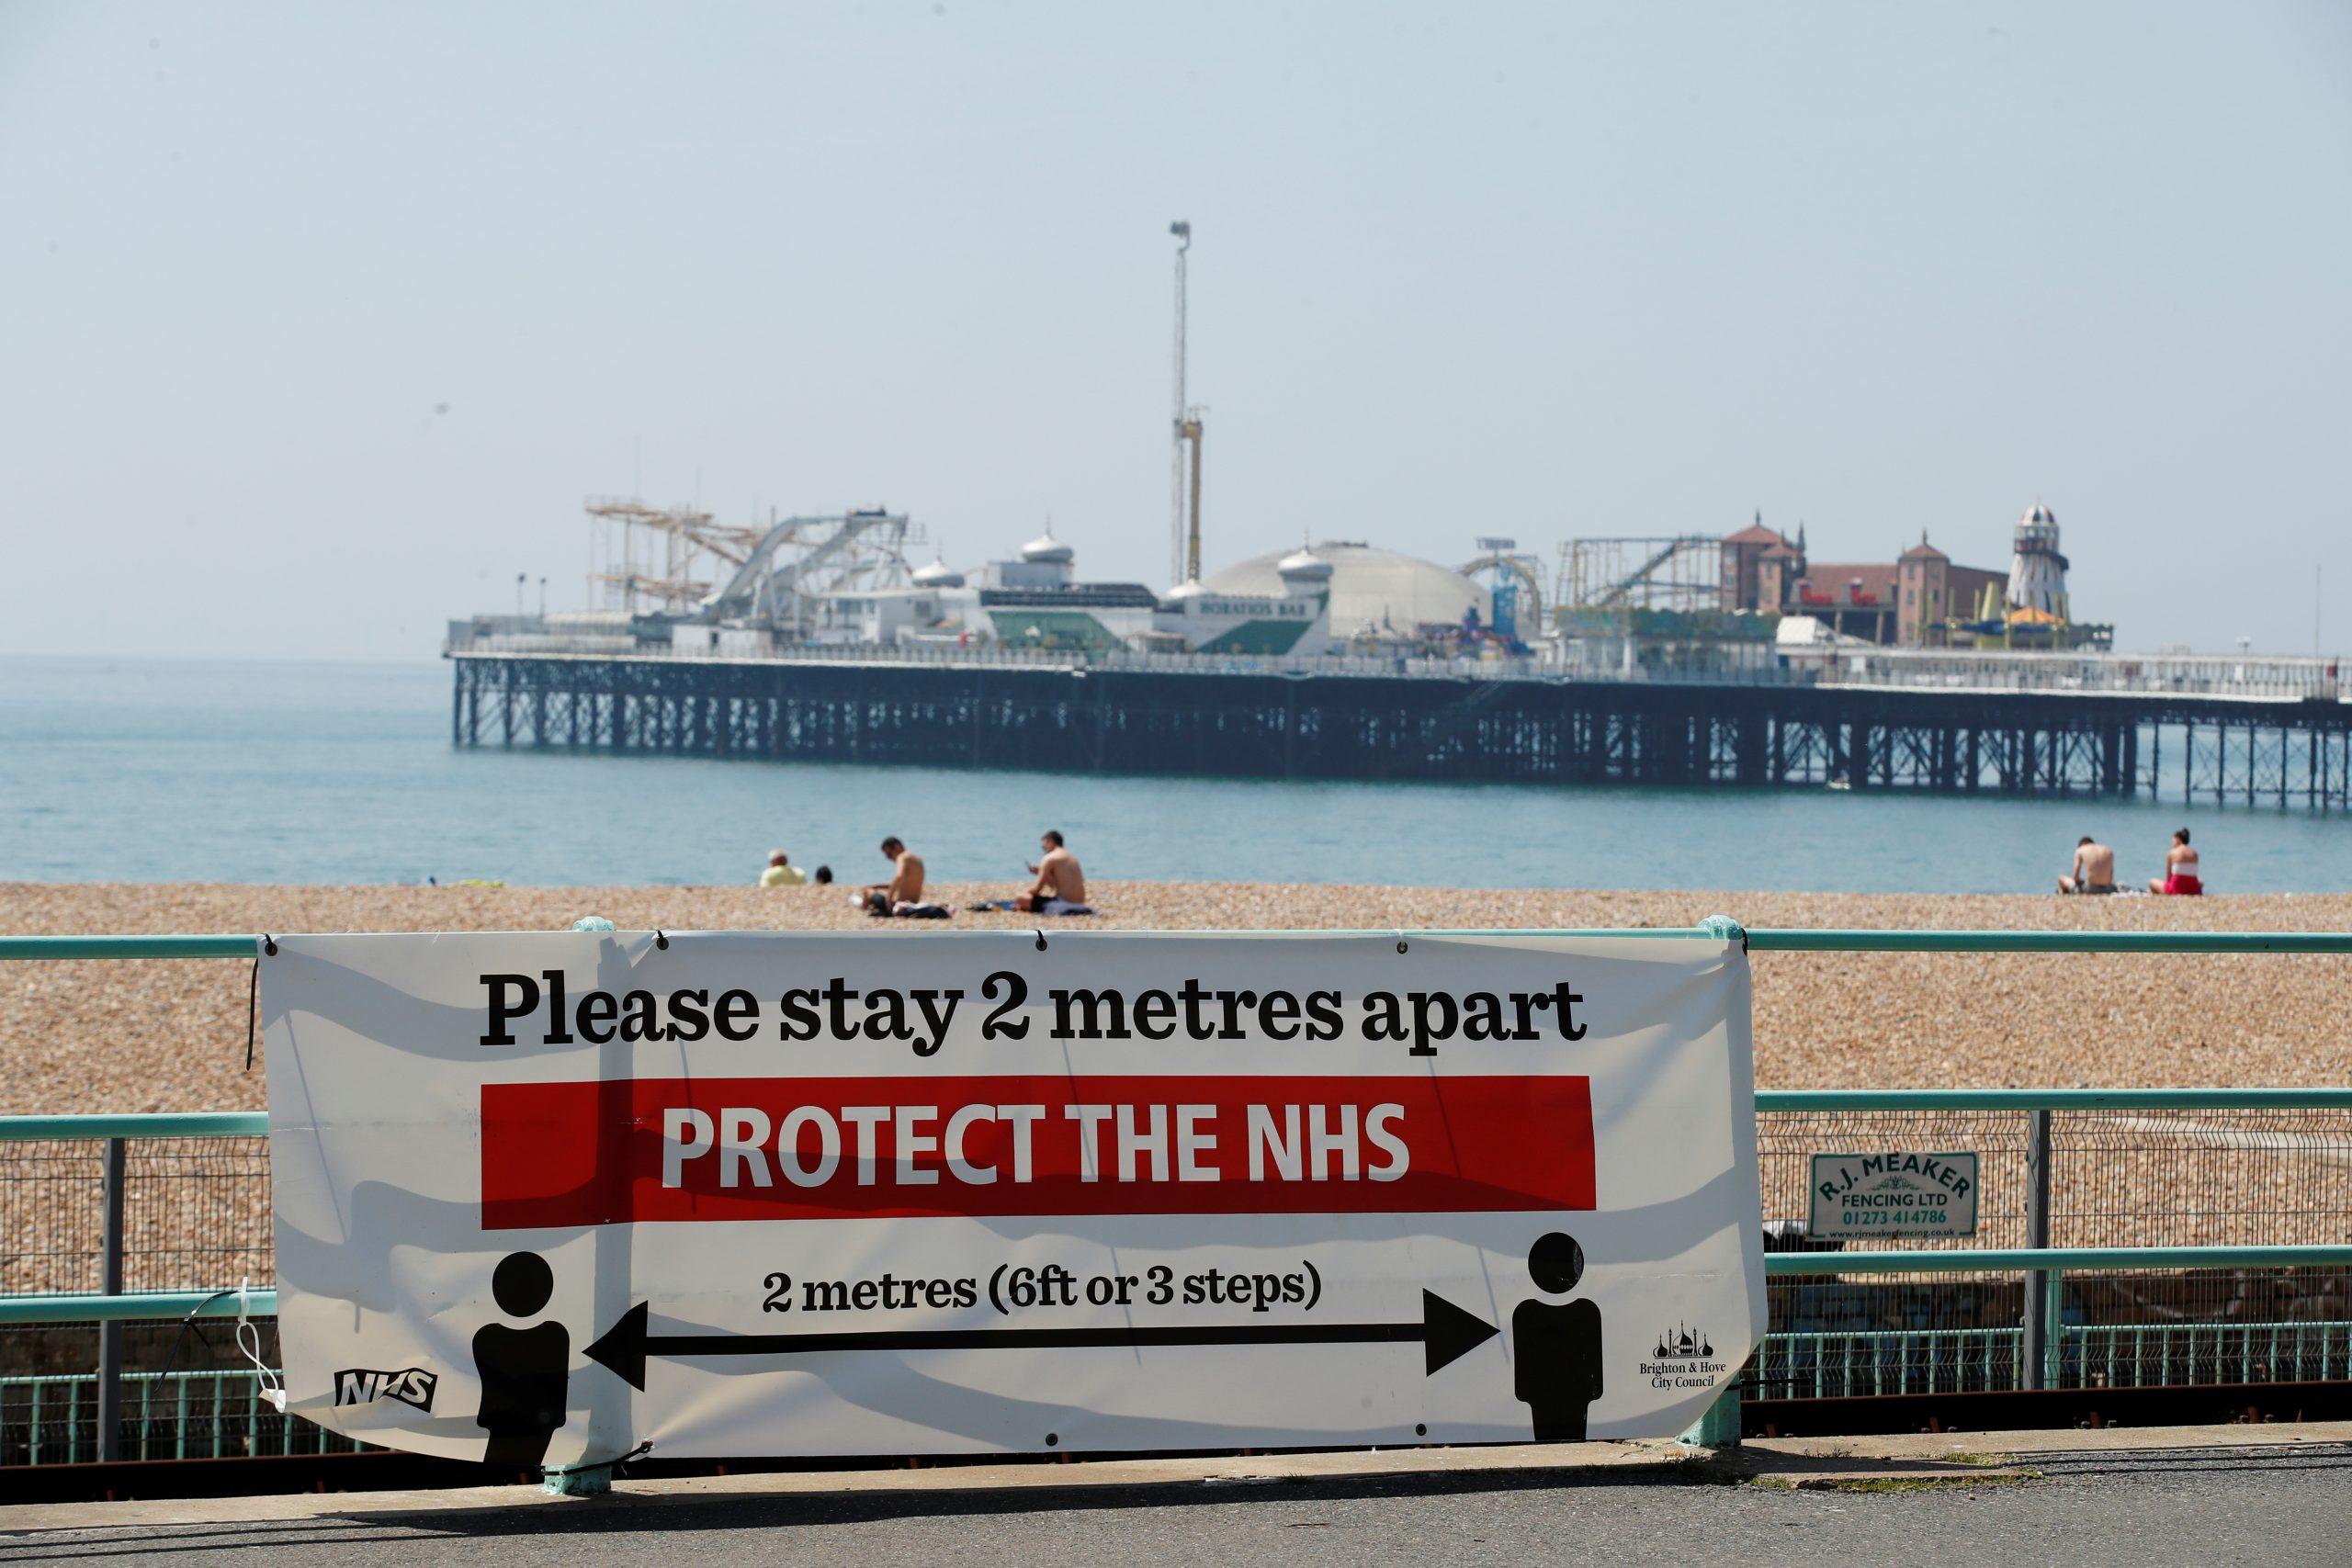 A social distancing banner at Brighton beach